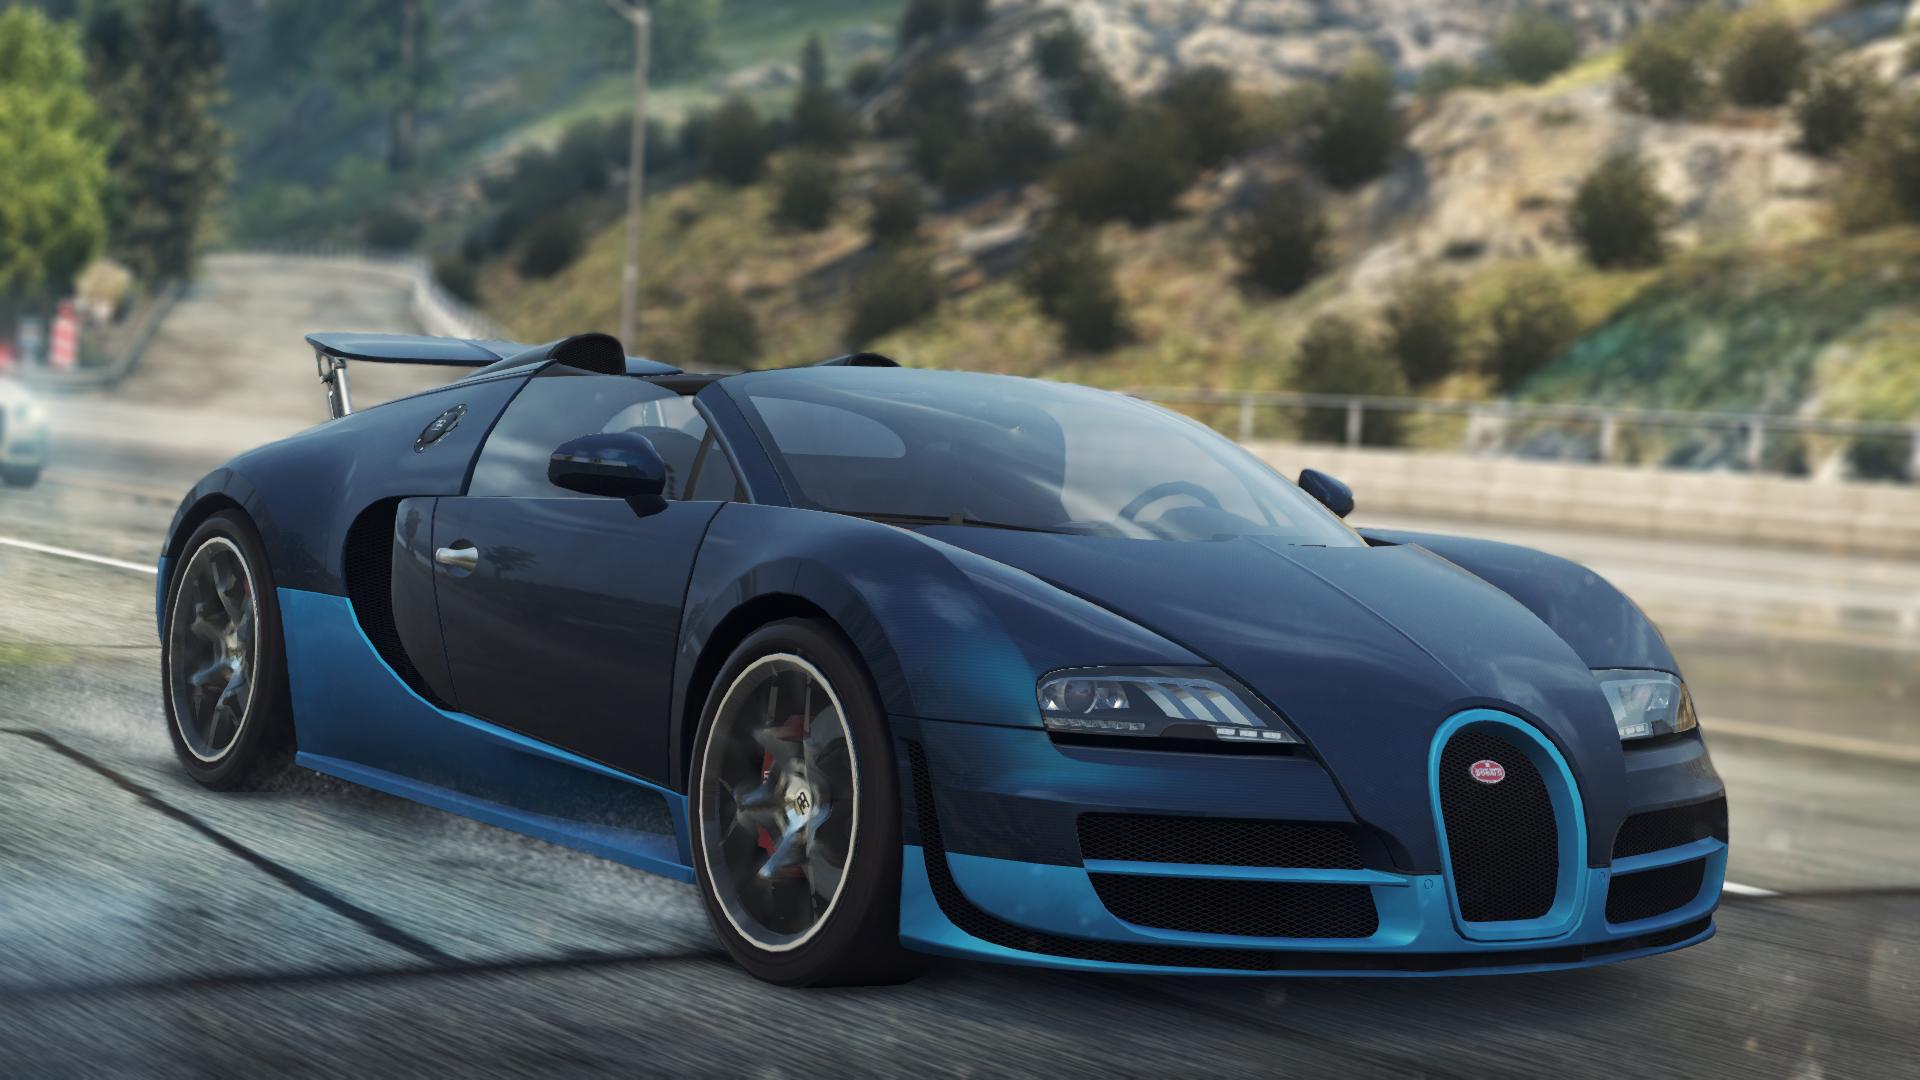 Bugatti Veyron Grand Sport Vitesse By AcerSense On DeviantArt